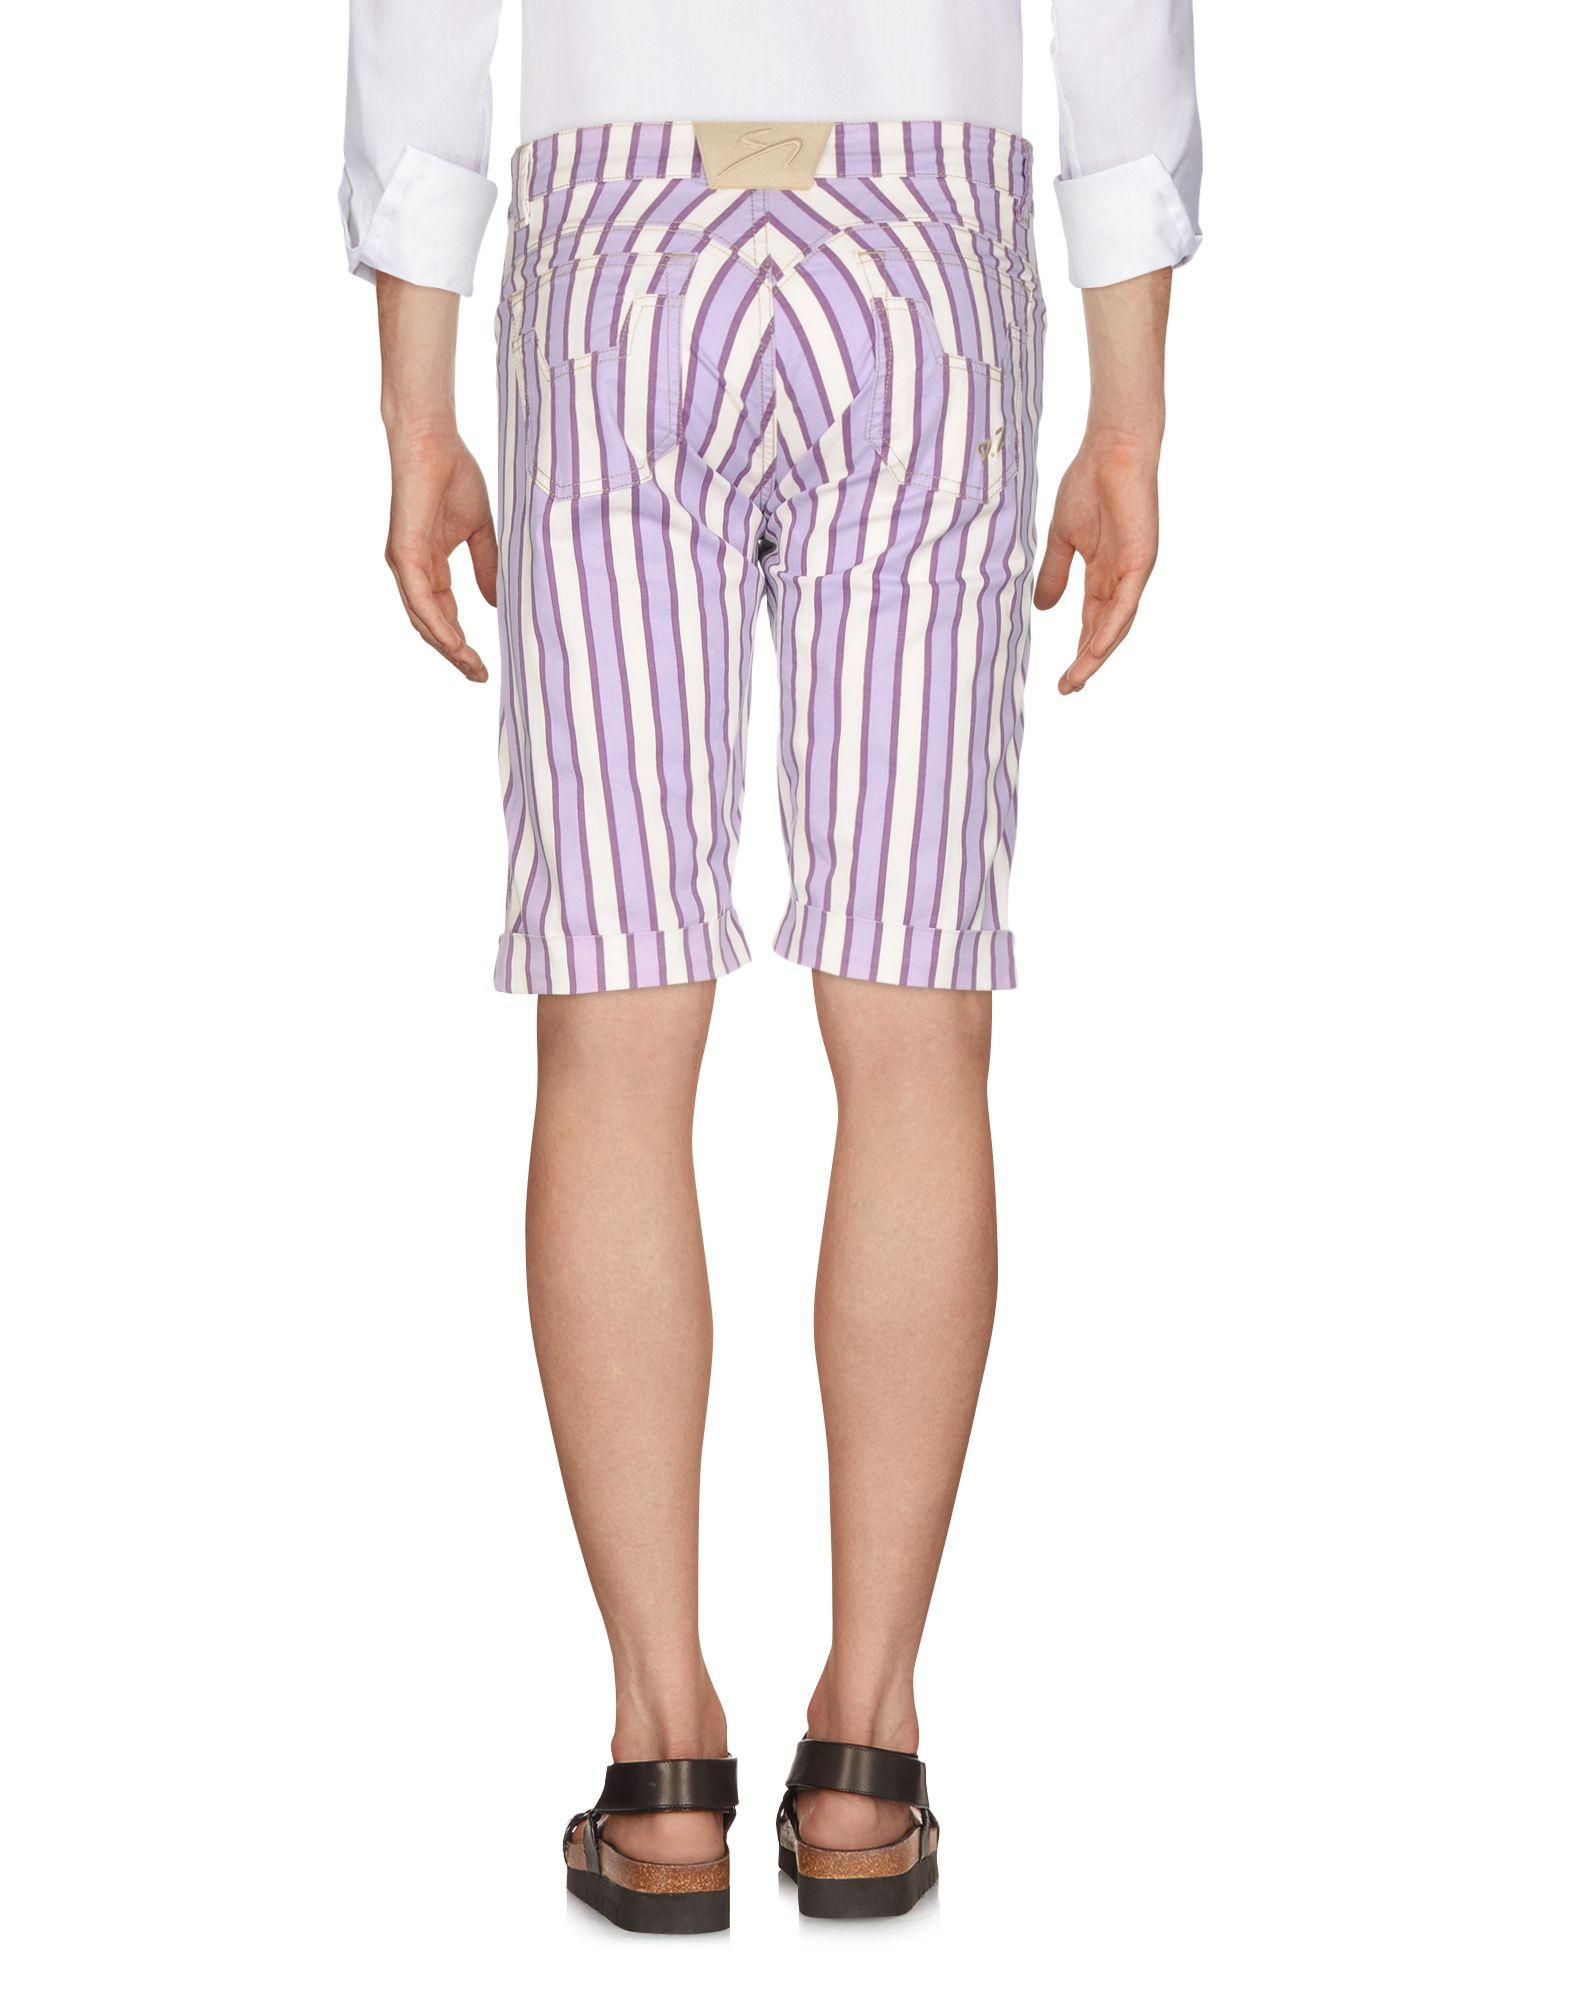 Shorts & Bermuda 9.2 By Carlo Chionna Chionna Chionna Uomo - 13160988XW e92d45